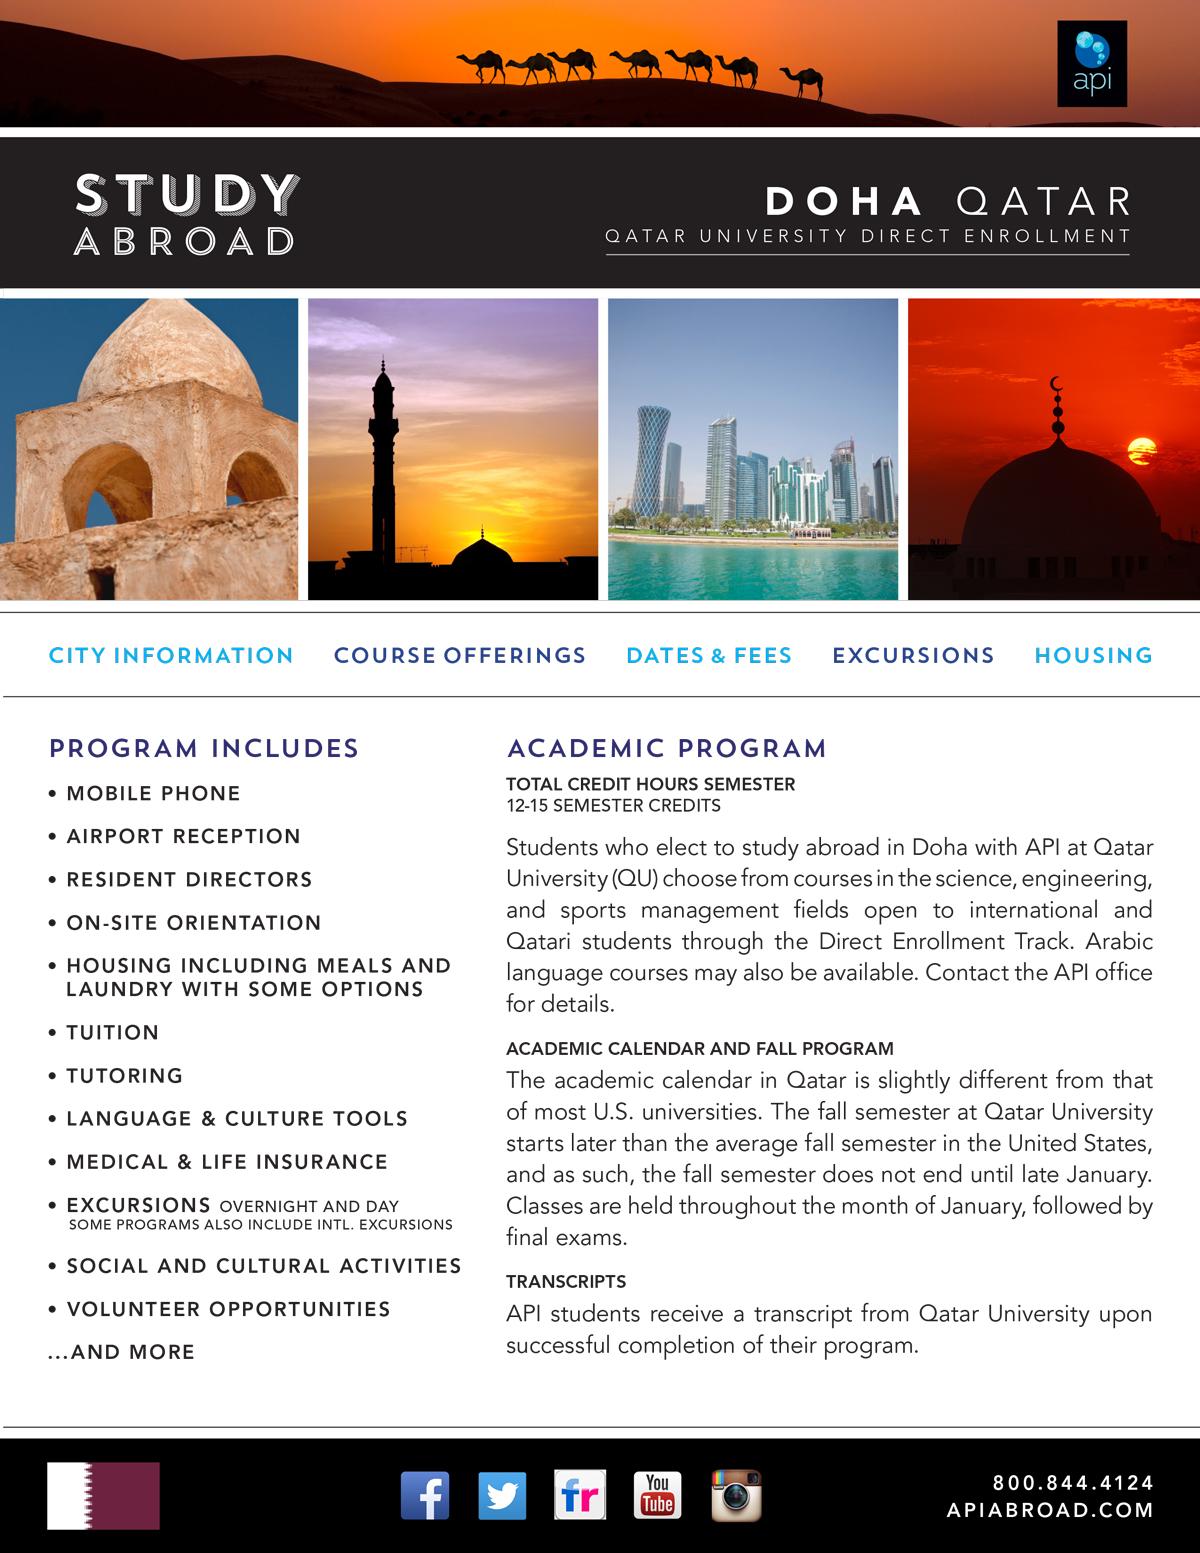 Executive Mba Program Programs Programsgt;brochuregt;center For Global Education